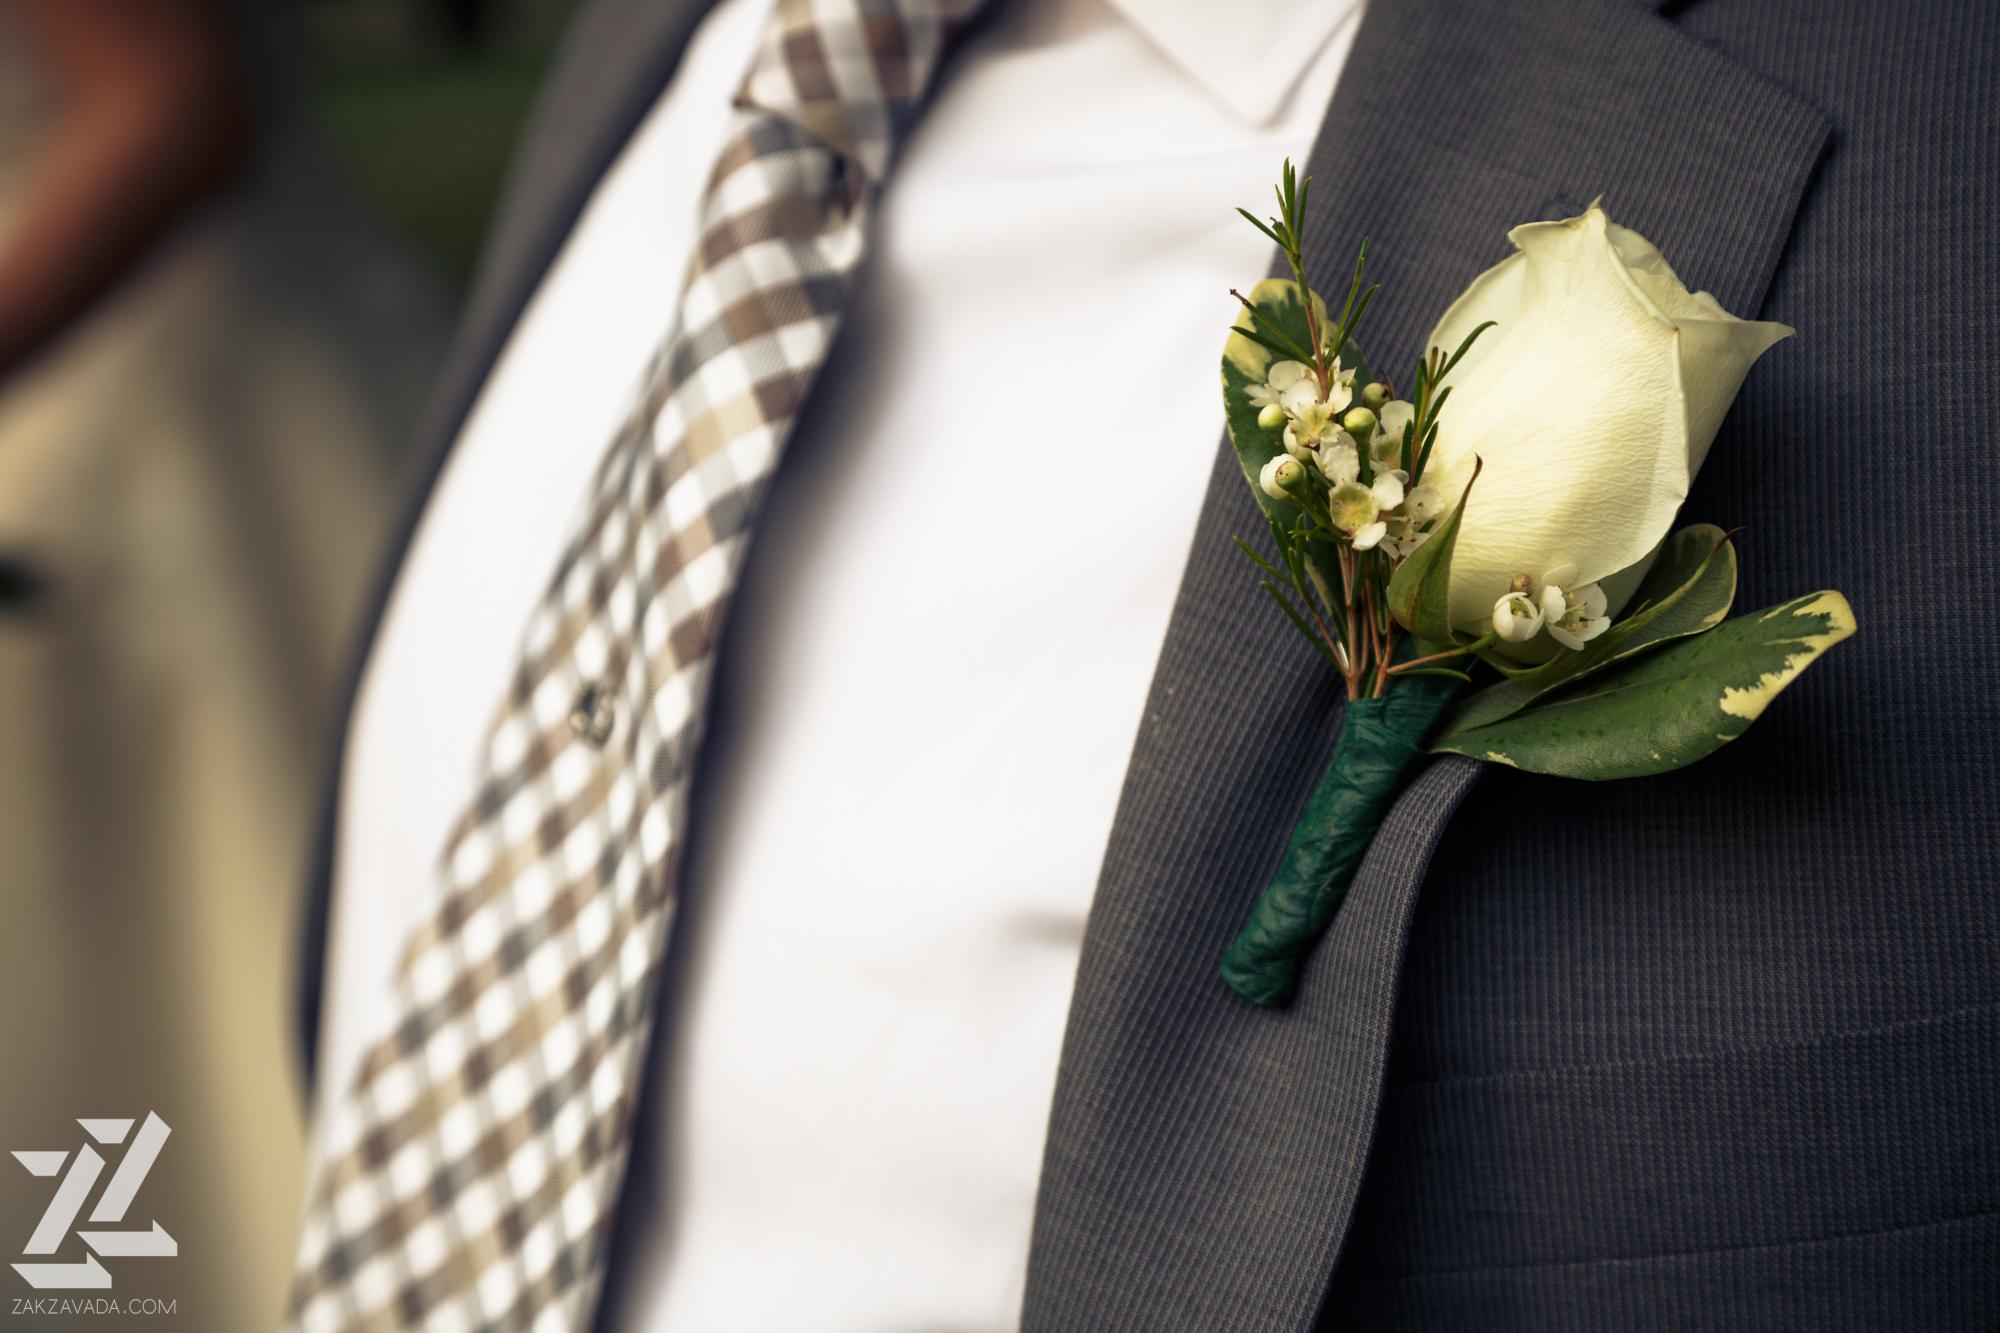 scranton-wedding-photography-zak-zavada-meganJonathan-456.jpg